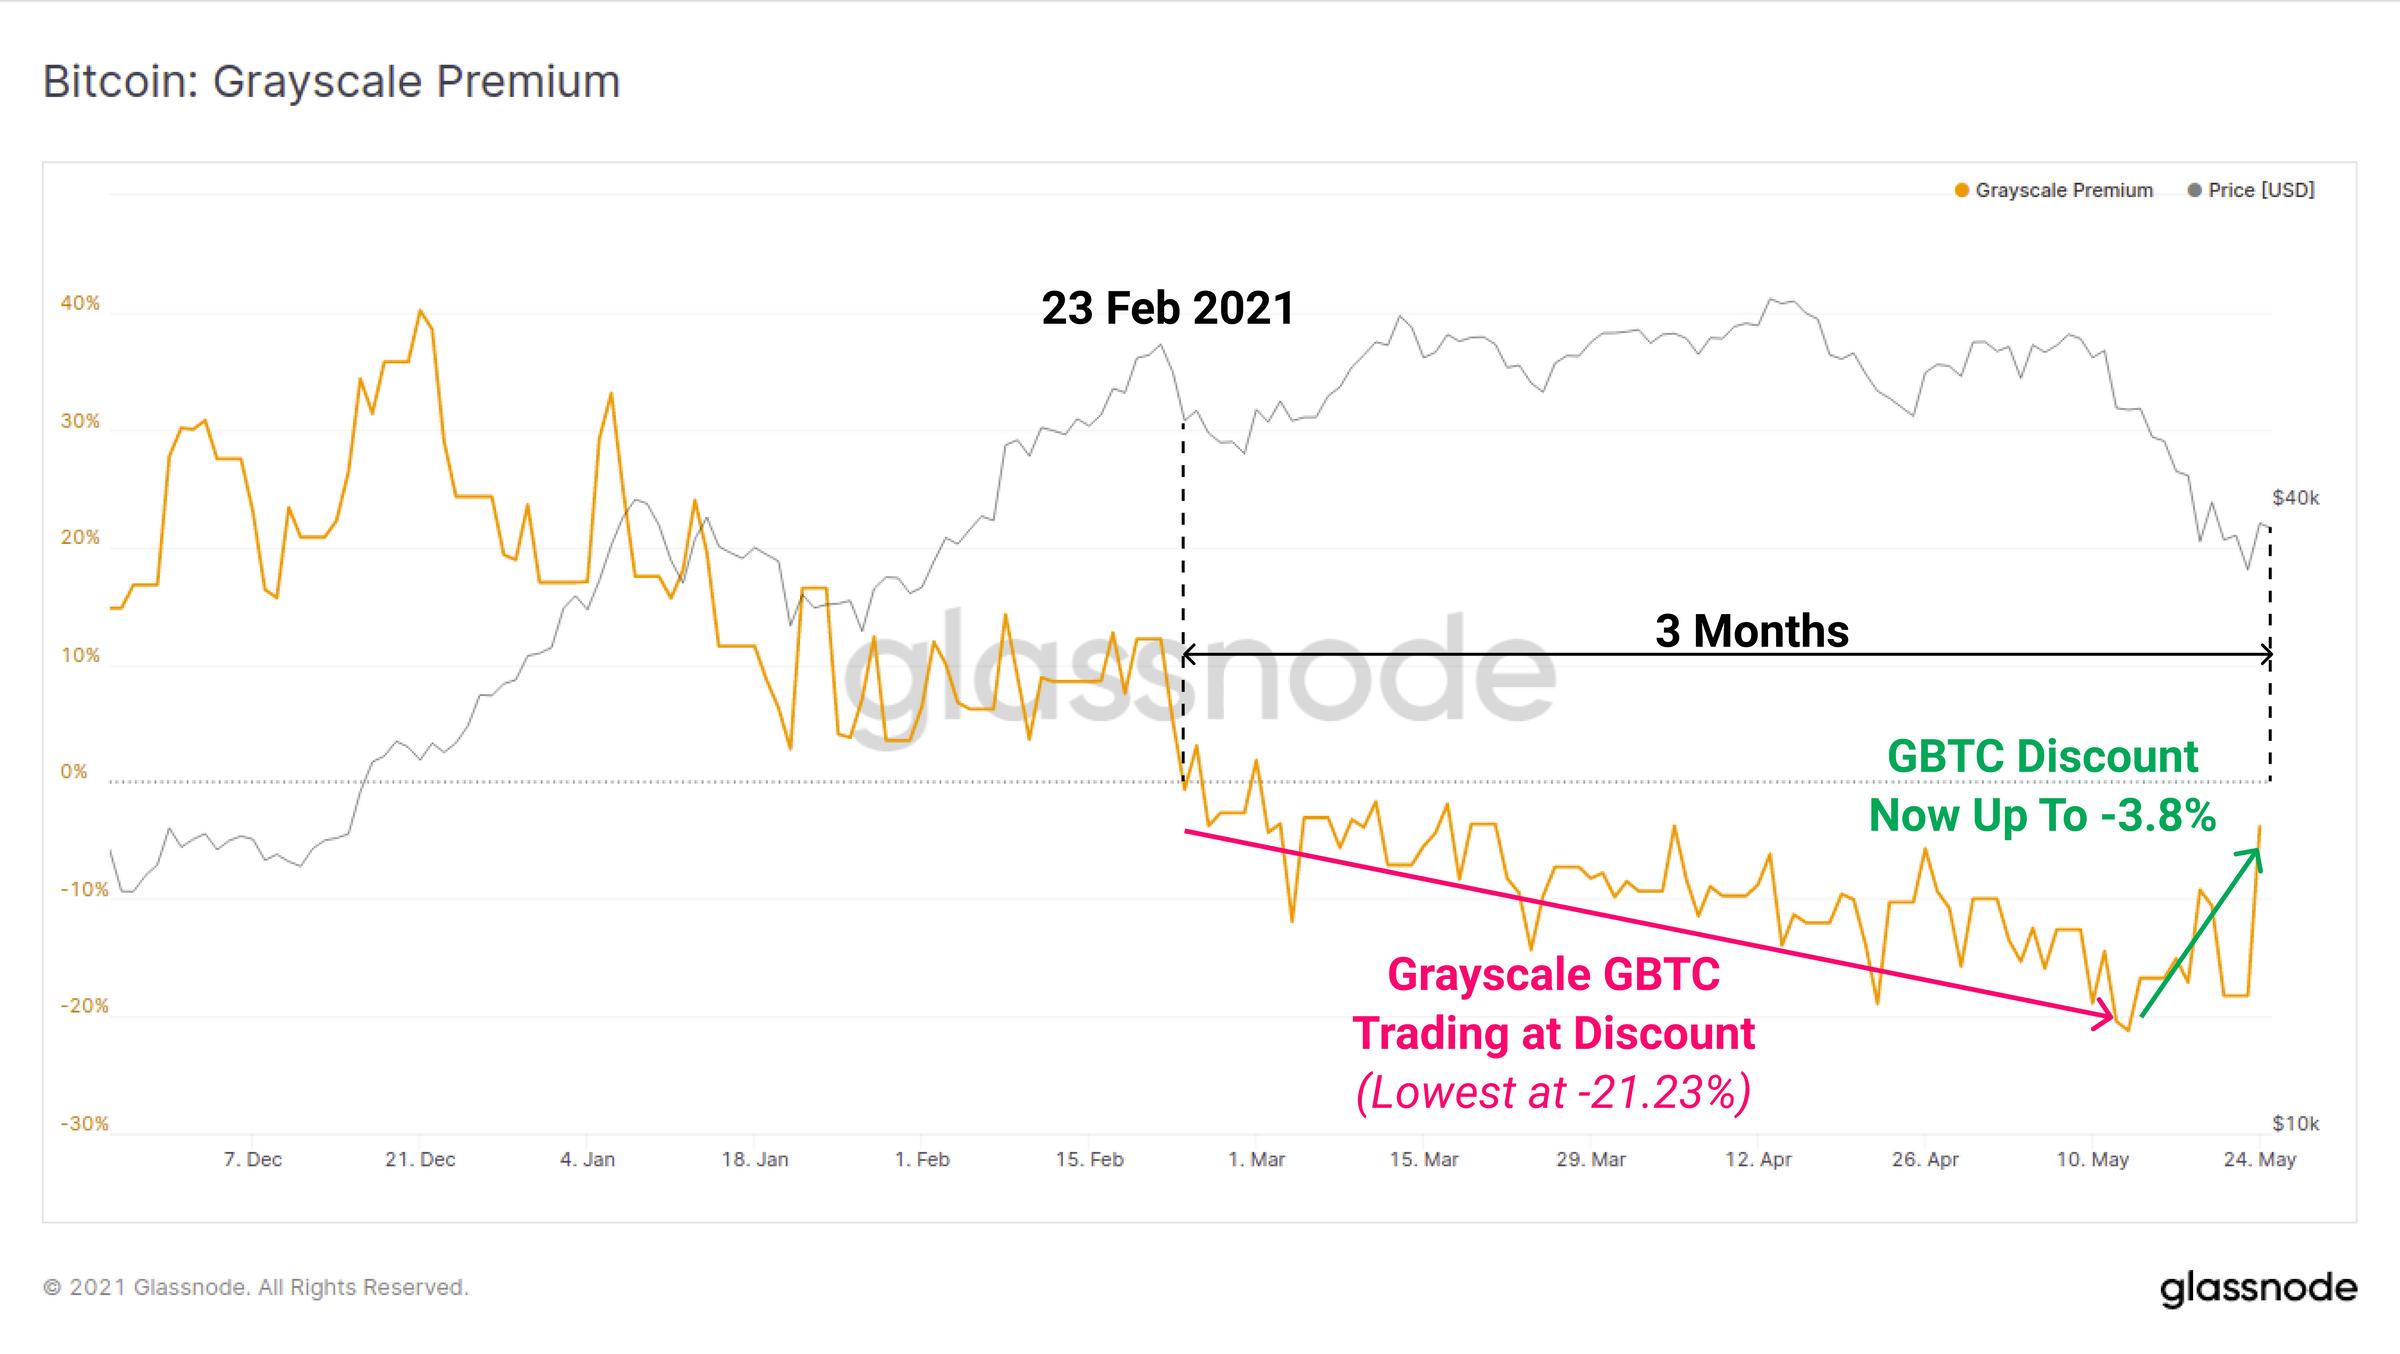 bitcoin investment trust (gbtc) prämie tools zum handel mit aktienoptionen